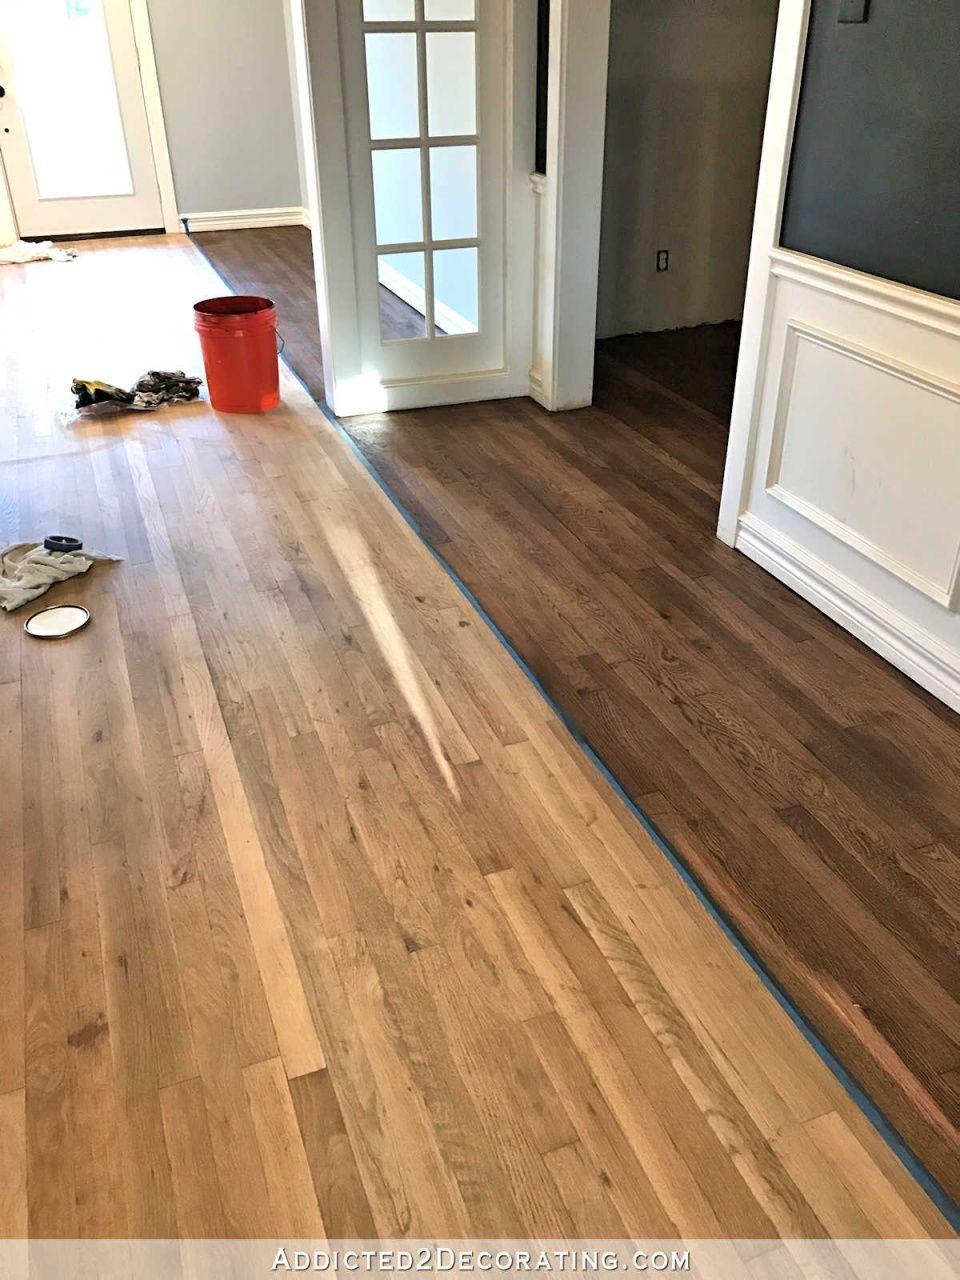 Laminate Wood Flooring Cost Laminate Wood Flooring Cost Flooring Cost Cost Of Laminate Flooring